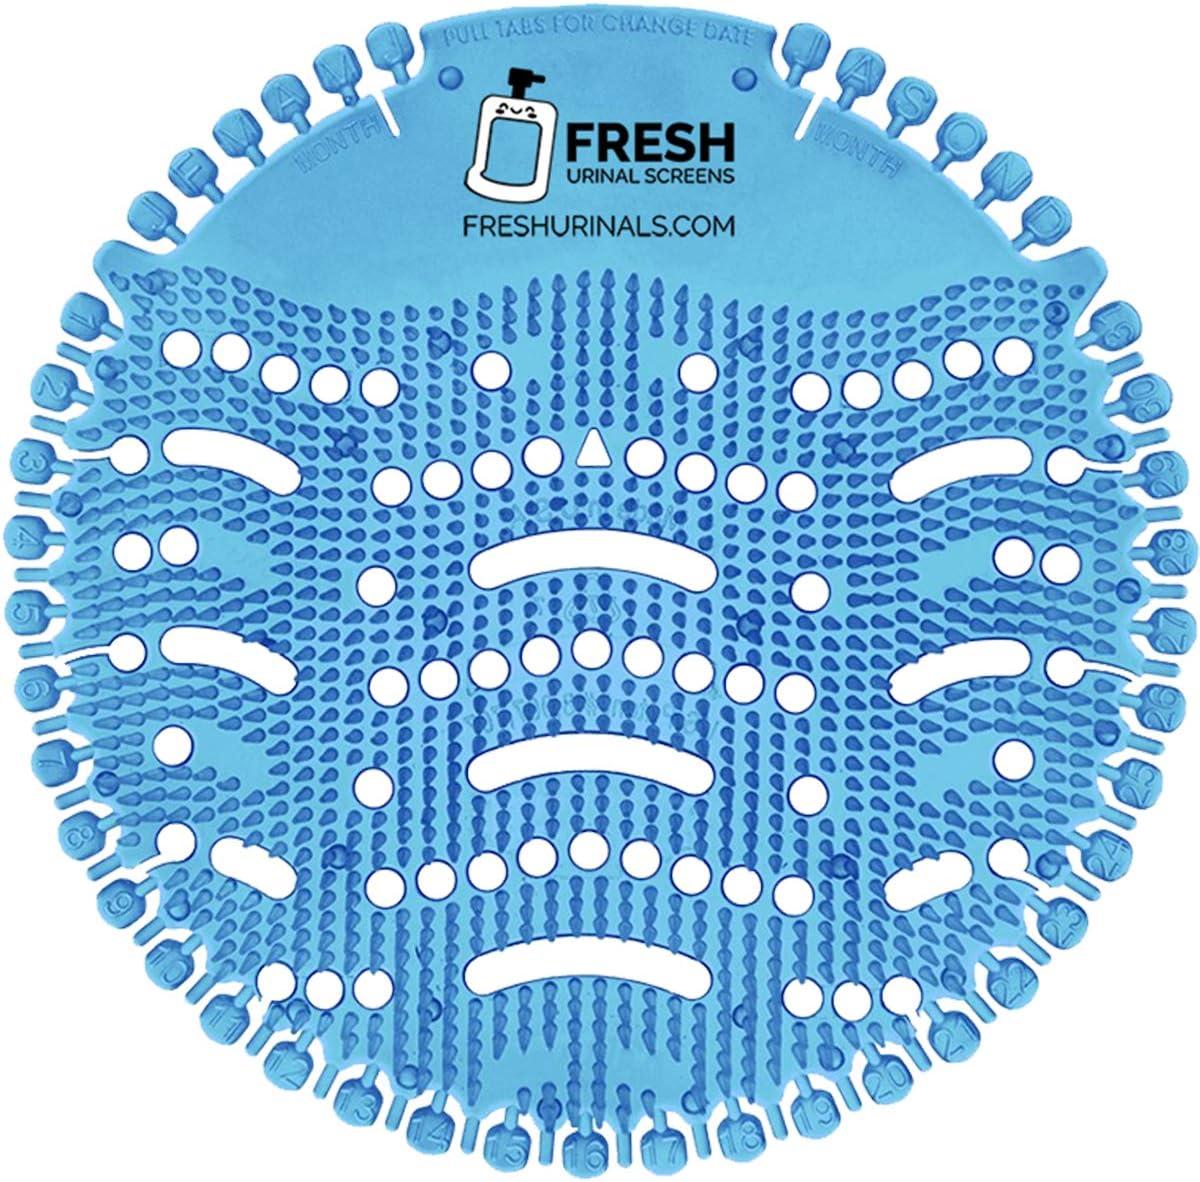 Urinal Screen Deodorizer (10 PACK) - Scent Lasts for Up to 5000 Flushes – Anti-Splash & Odor Neutralizer – Ideal for Bathrooms, Restrooms, Office, Restaurants, Schools – Ocean Mist Fragrance